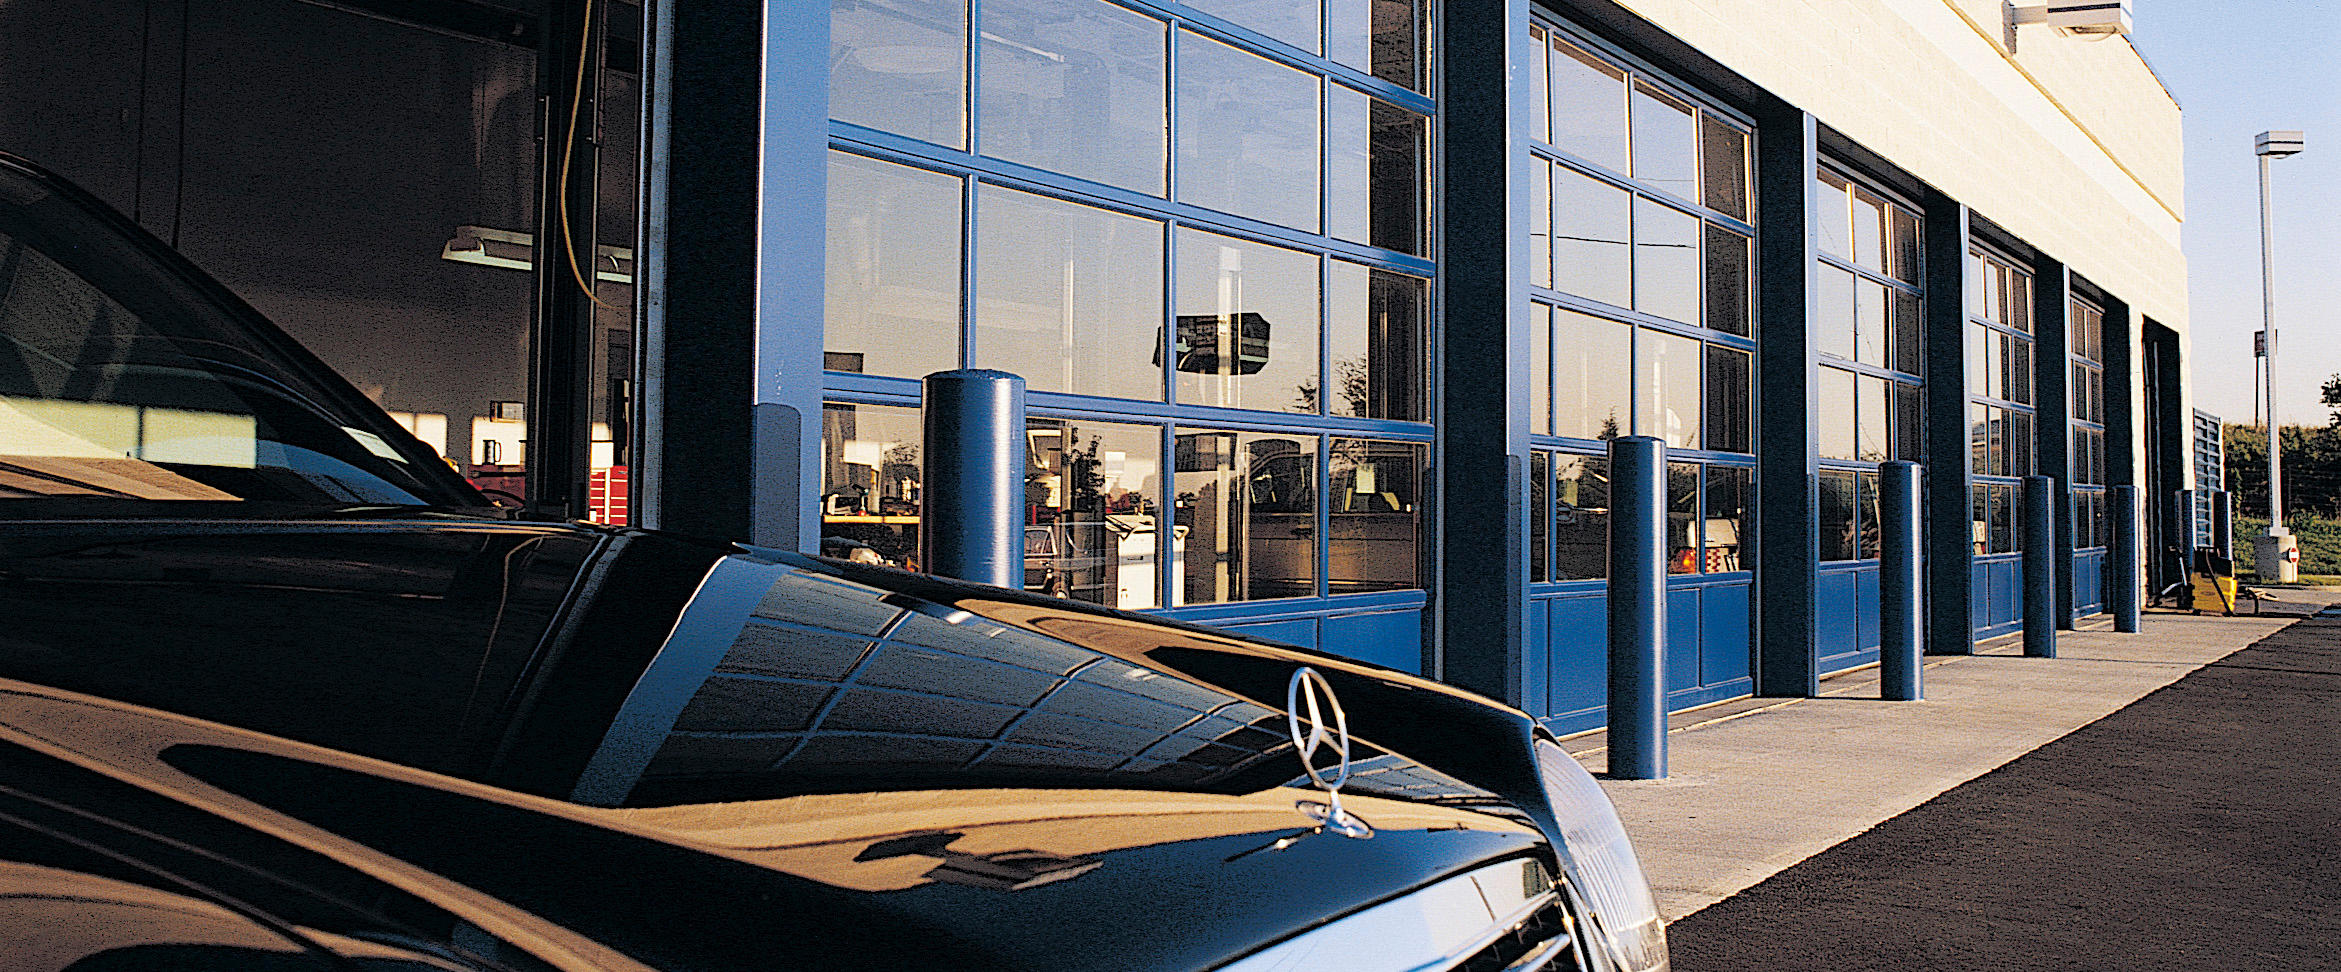 Duval Overhead Doors, Inc. image 4